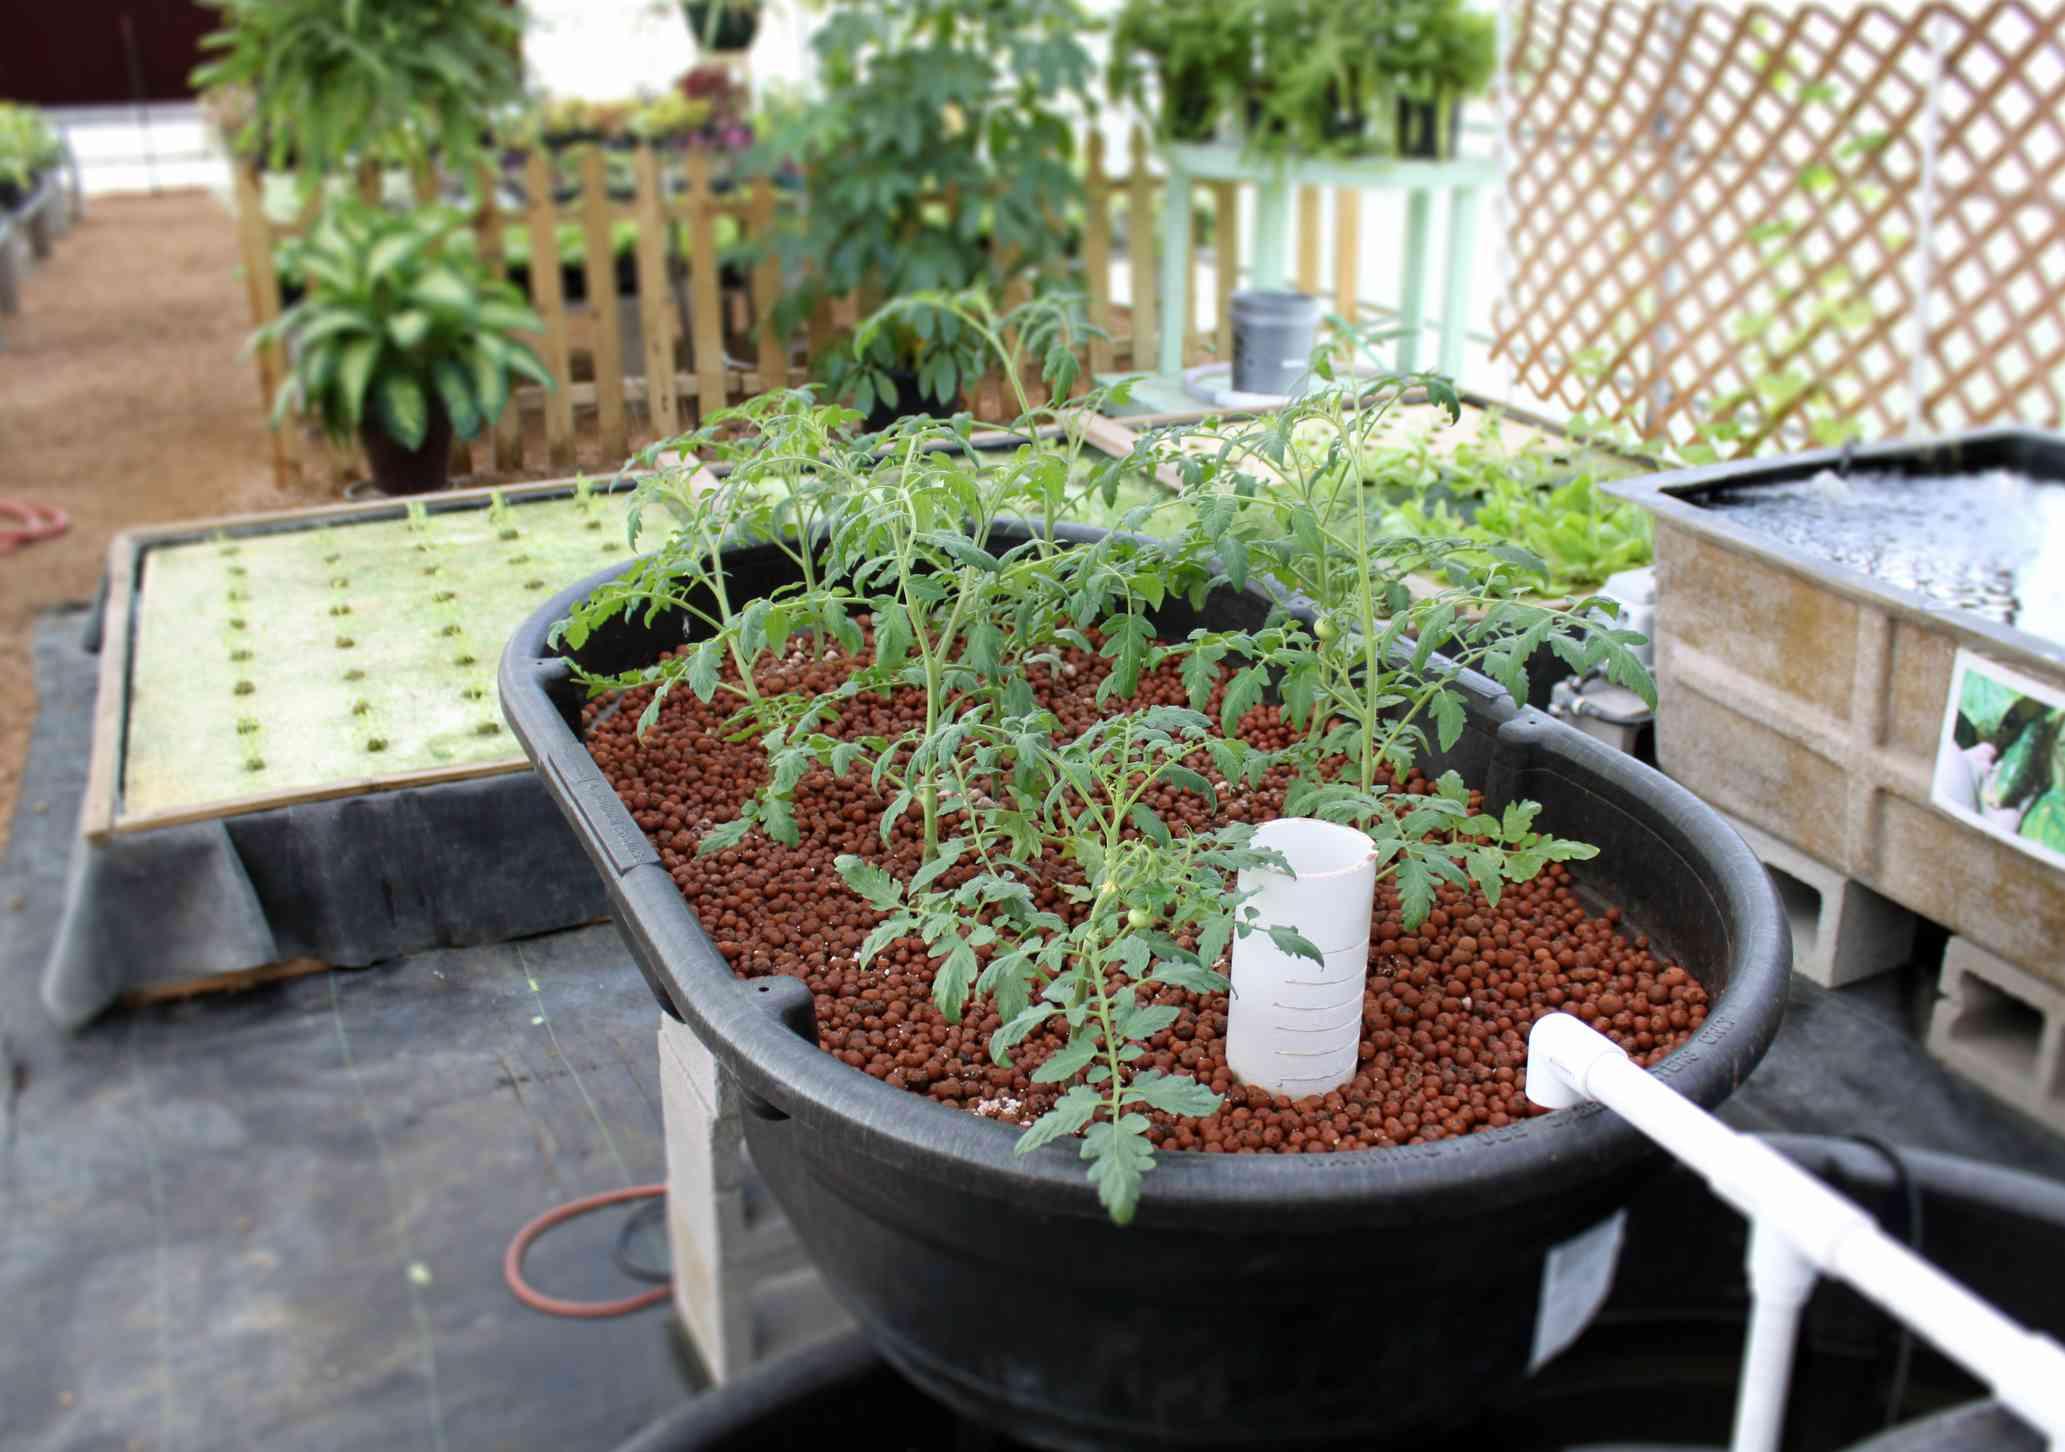 Tomato plants growing in aquaponics system using hydroponics